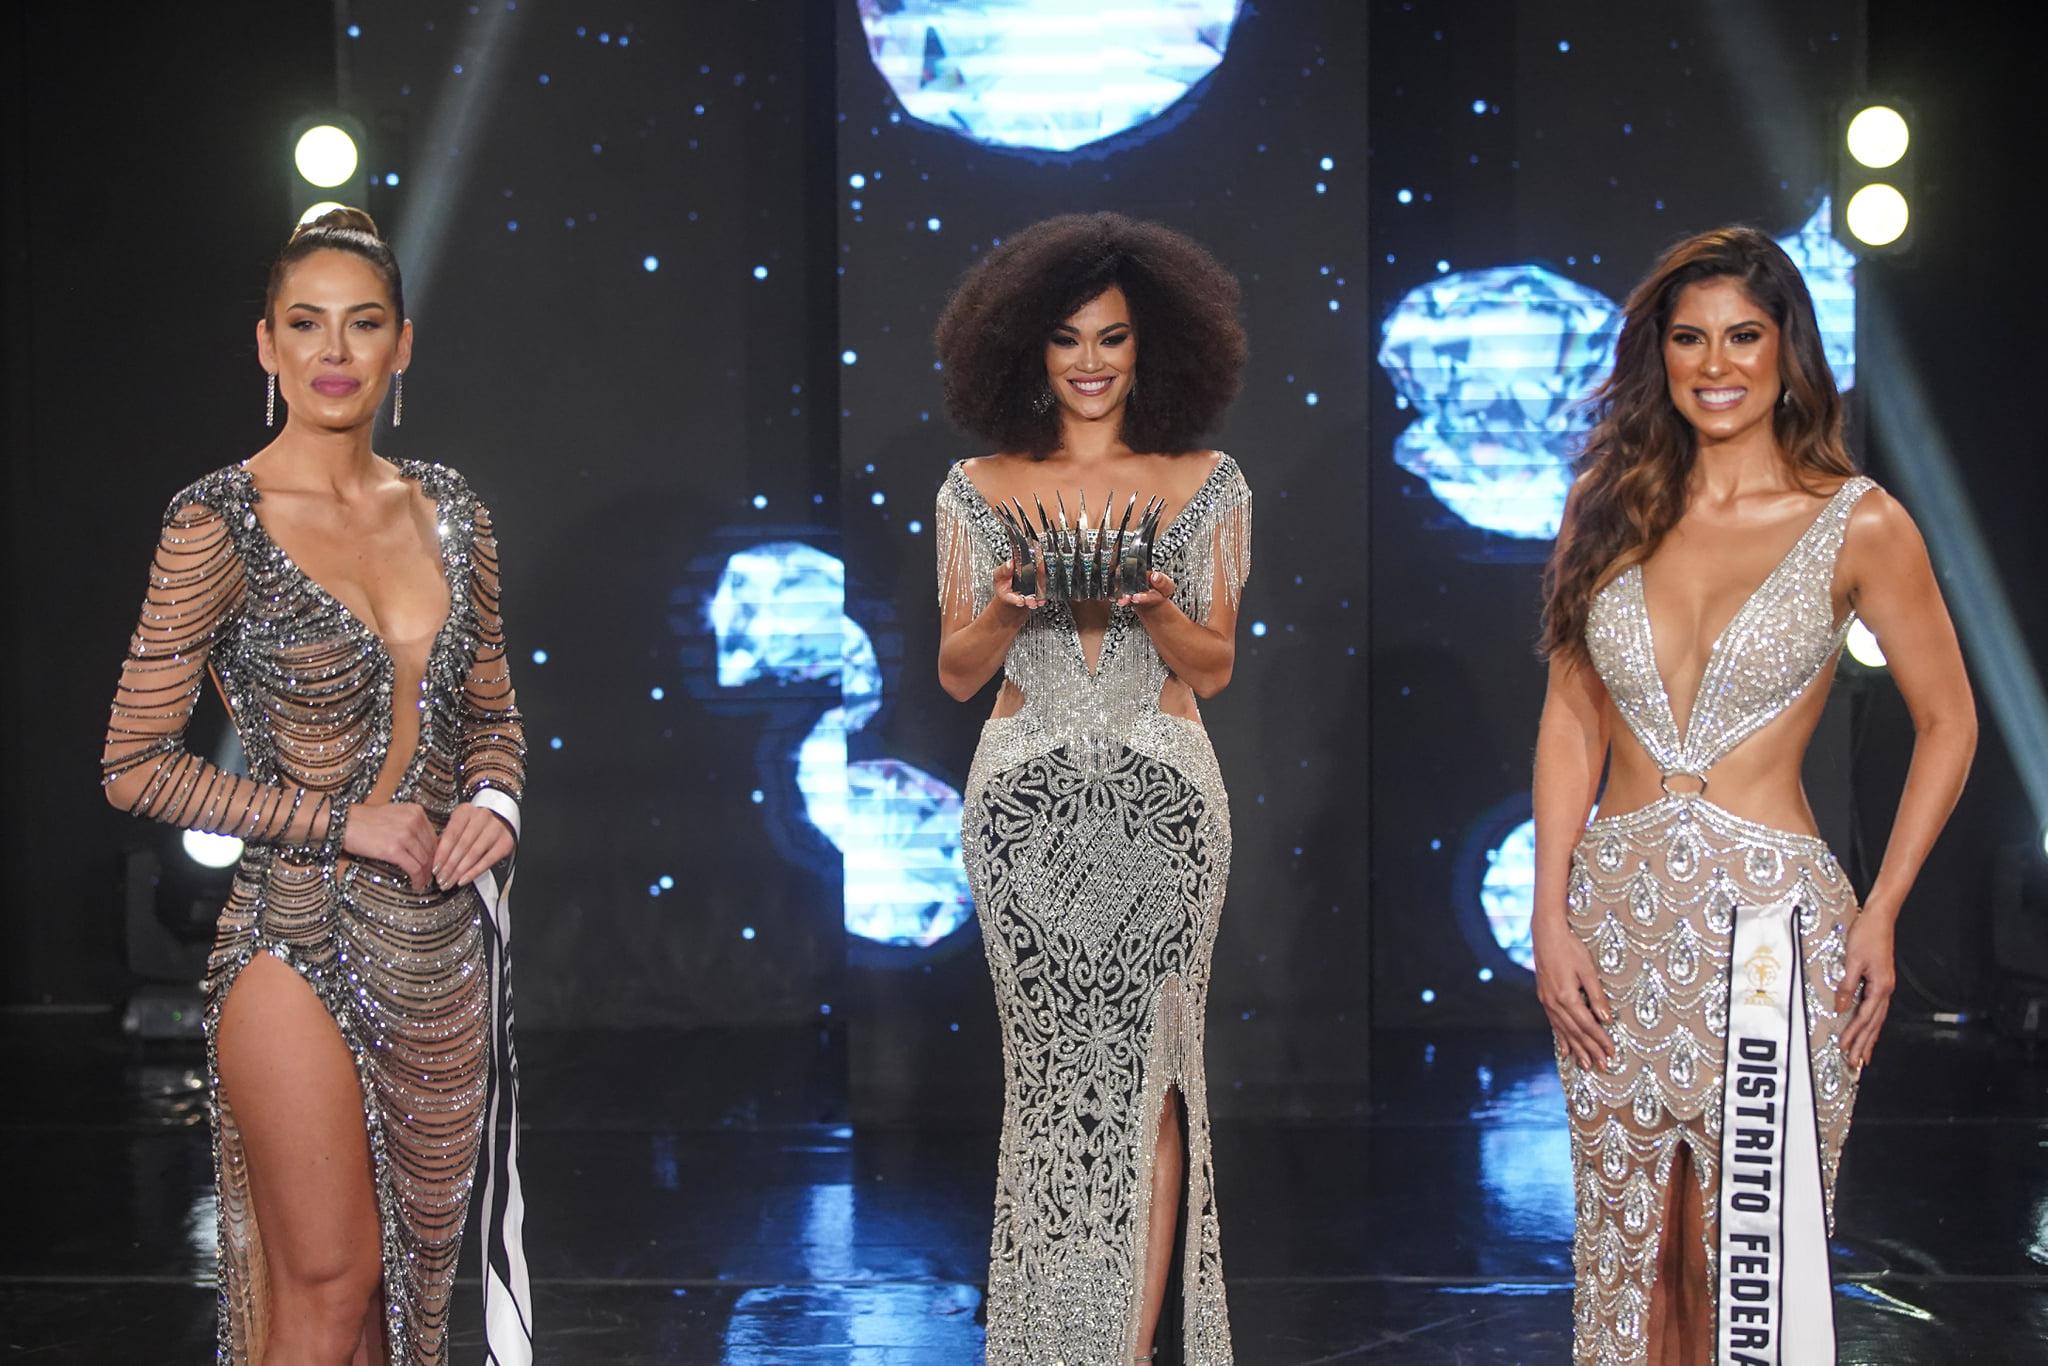 bruna zanardo, 1st runner-up de miss supranational brazil 2020/miss brasil internacional 2017/miss brasil terra 2016. - Página 20 12842412